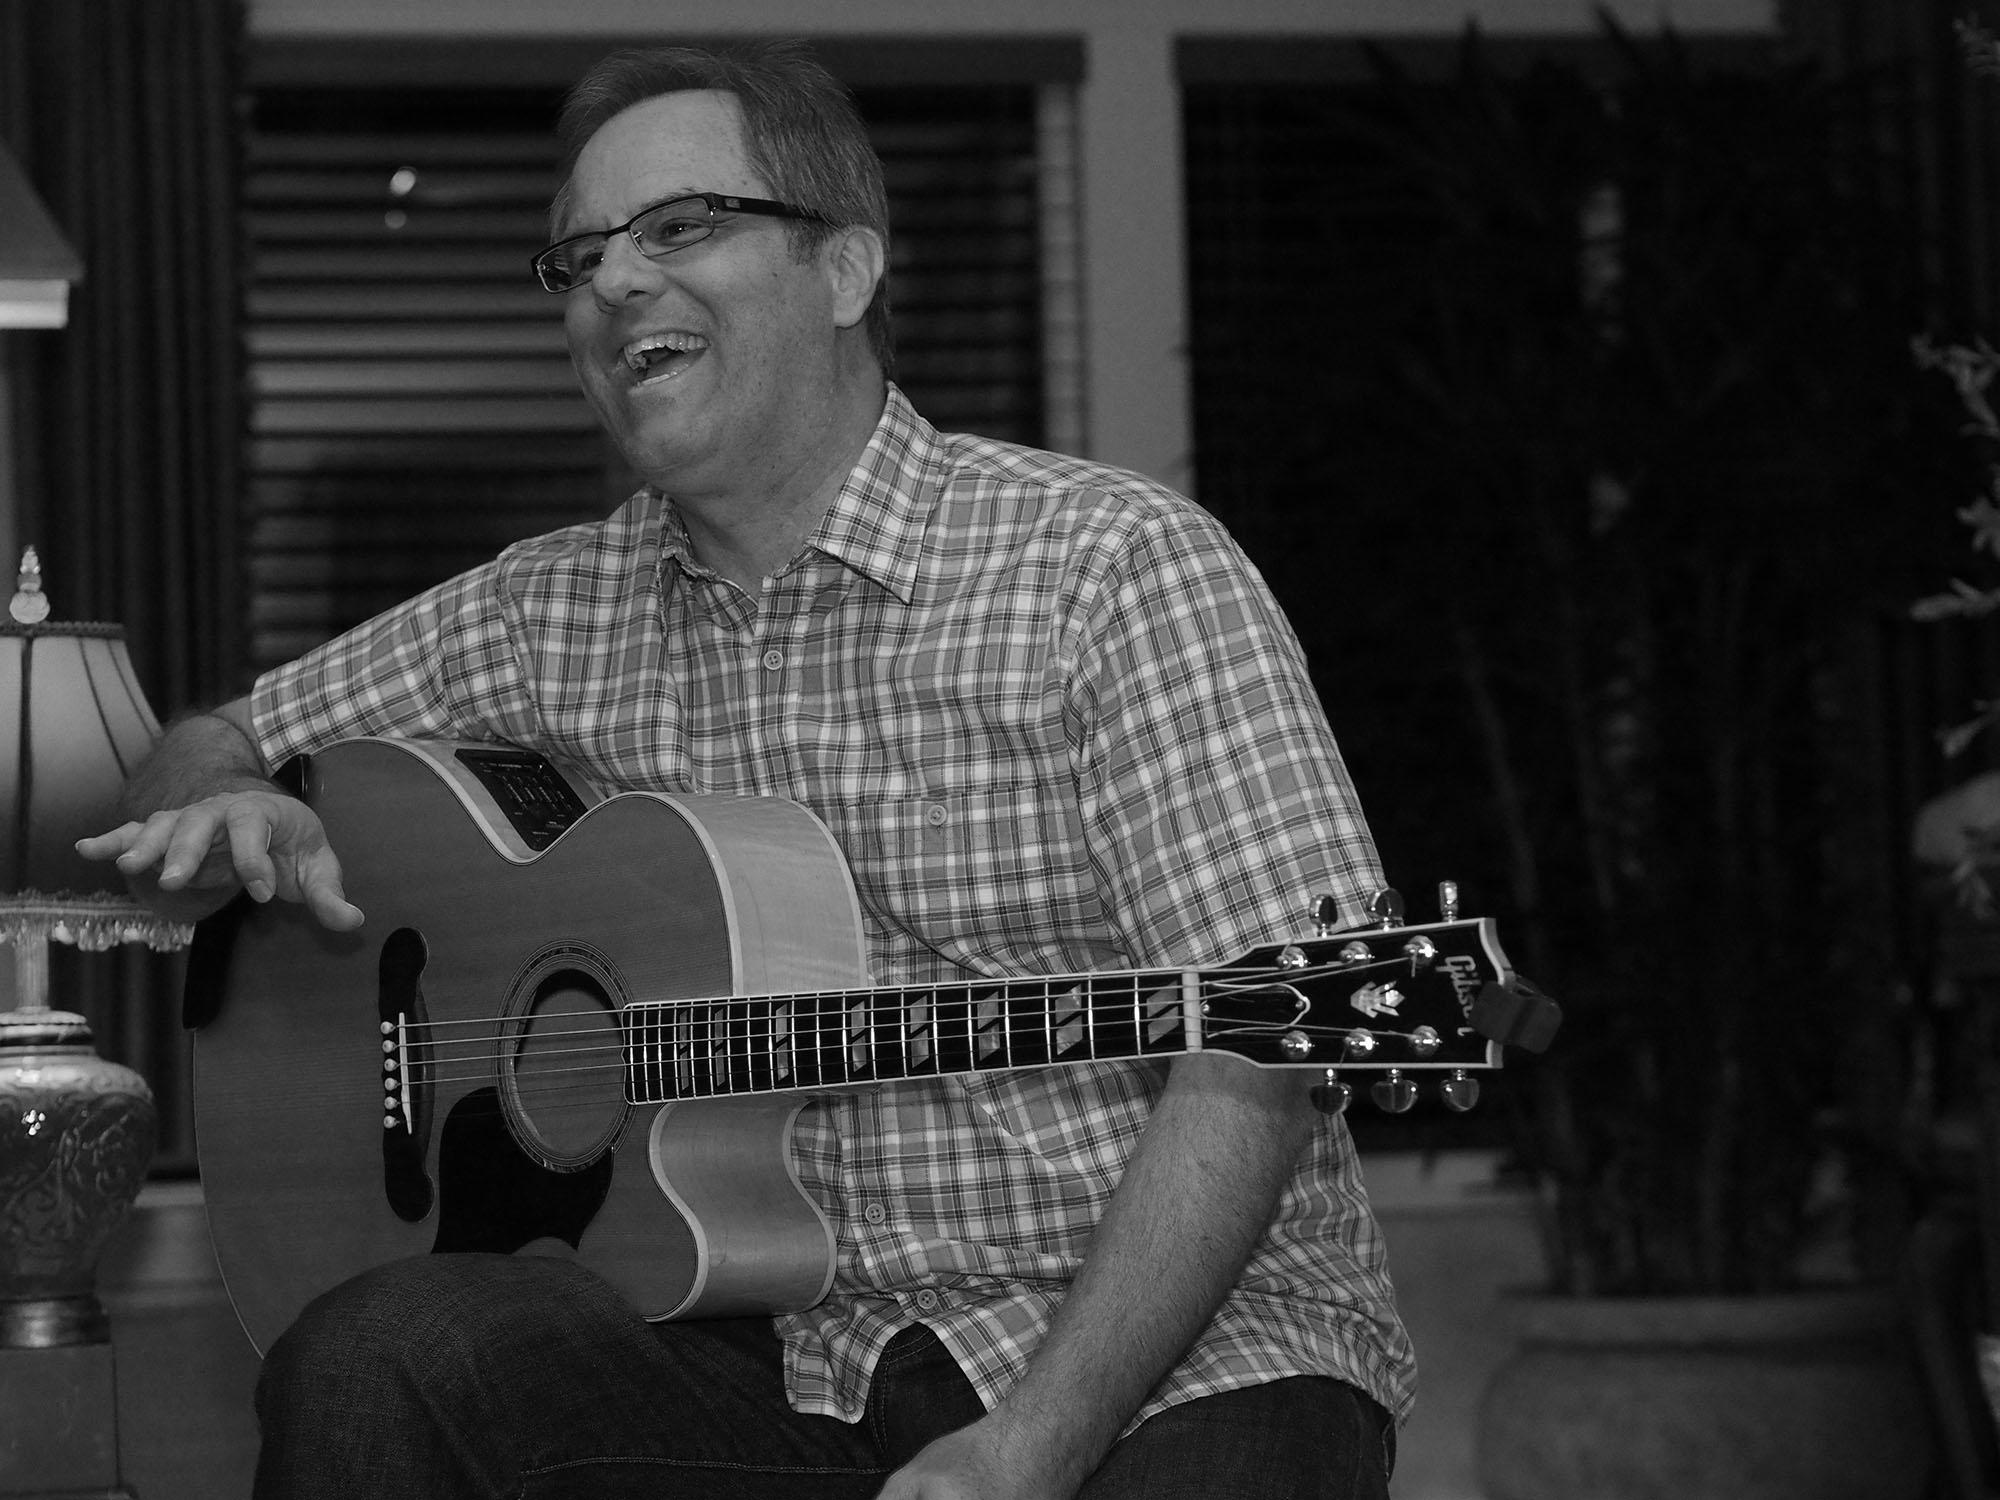 Russ Tapley: Acoustic Guitarist, Singer/Songwriter